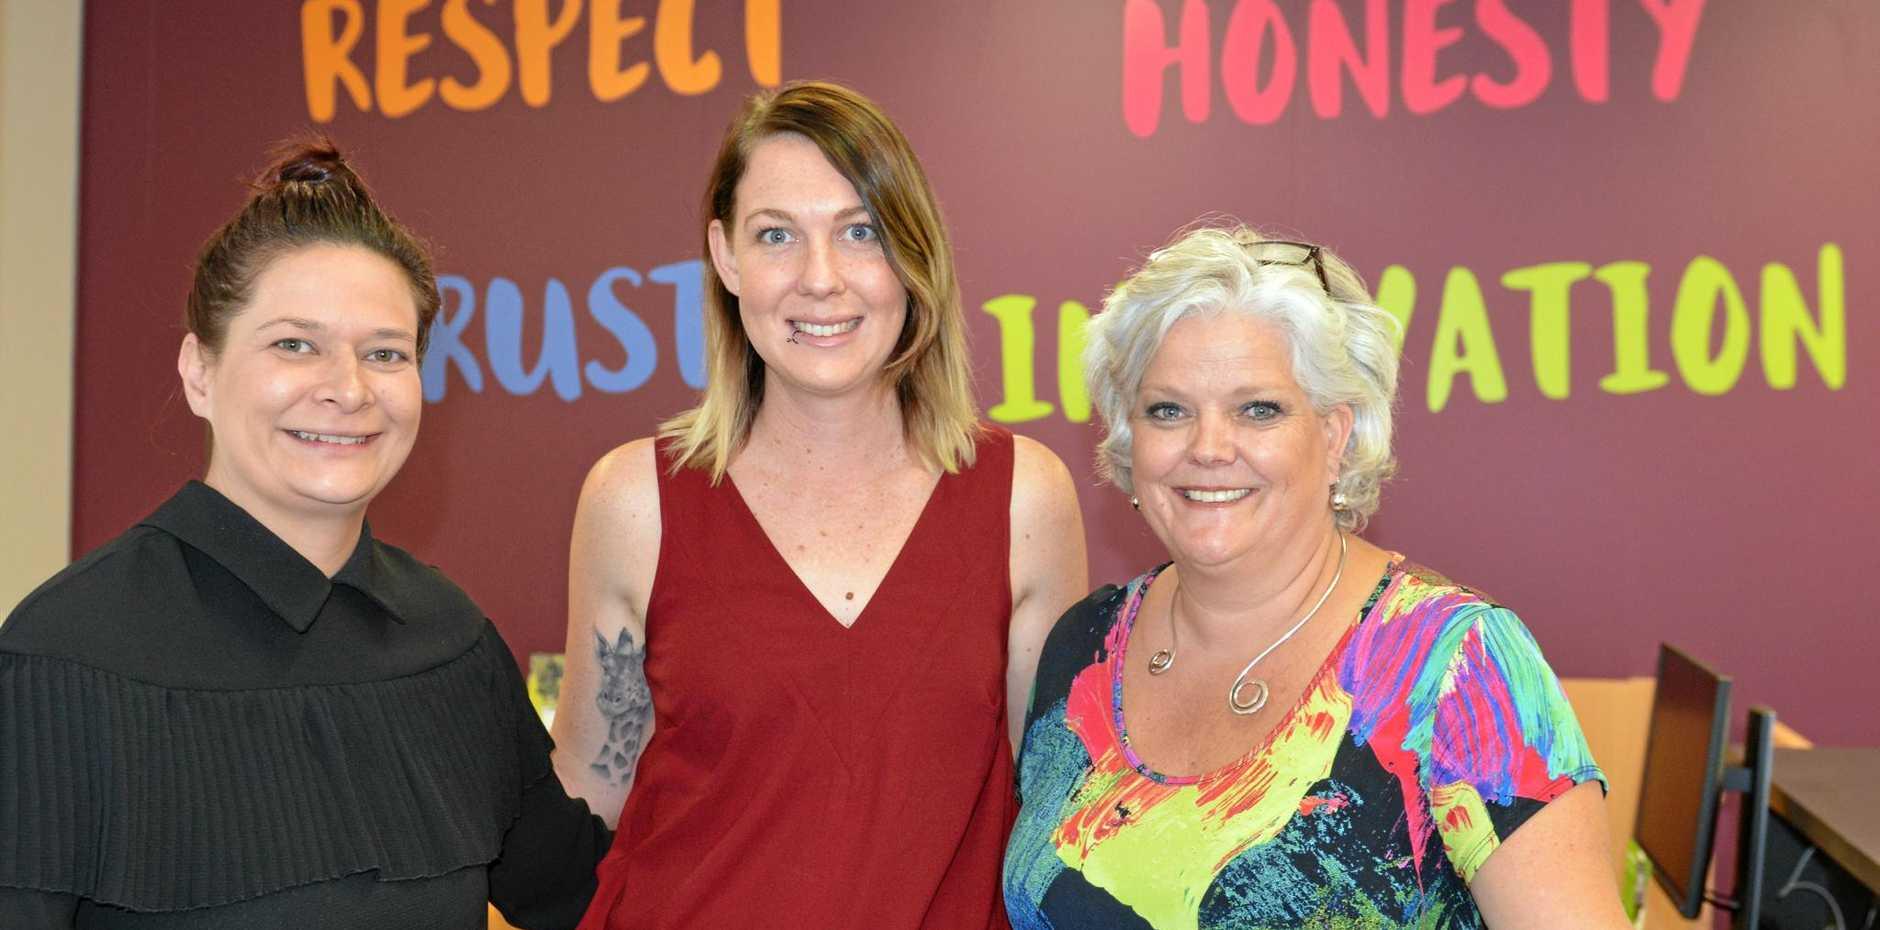 TWEED TEAM: Jarel Phillips, team leader Nicole Heffernan and regional manager Patricia Foulds.